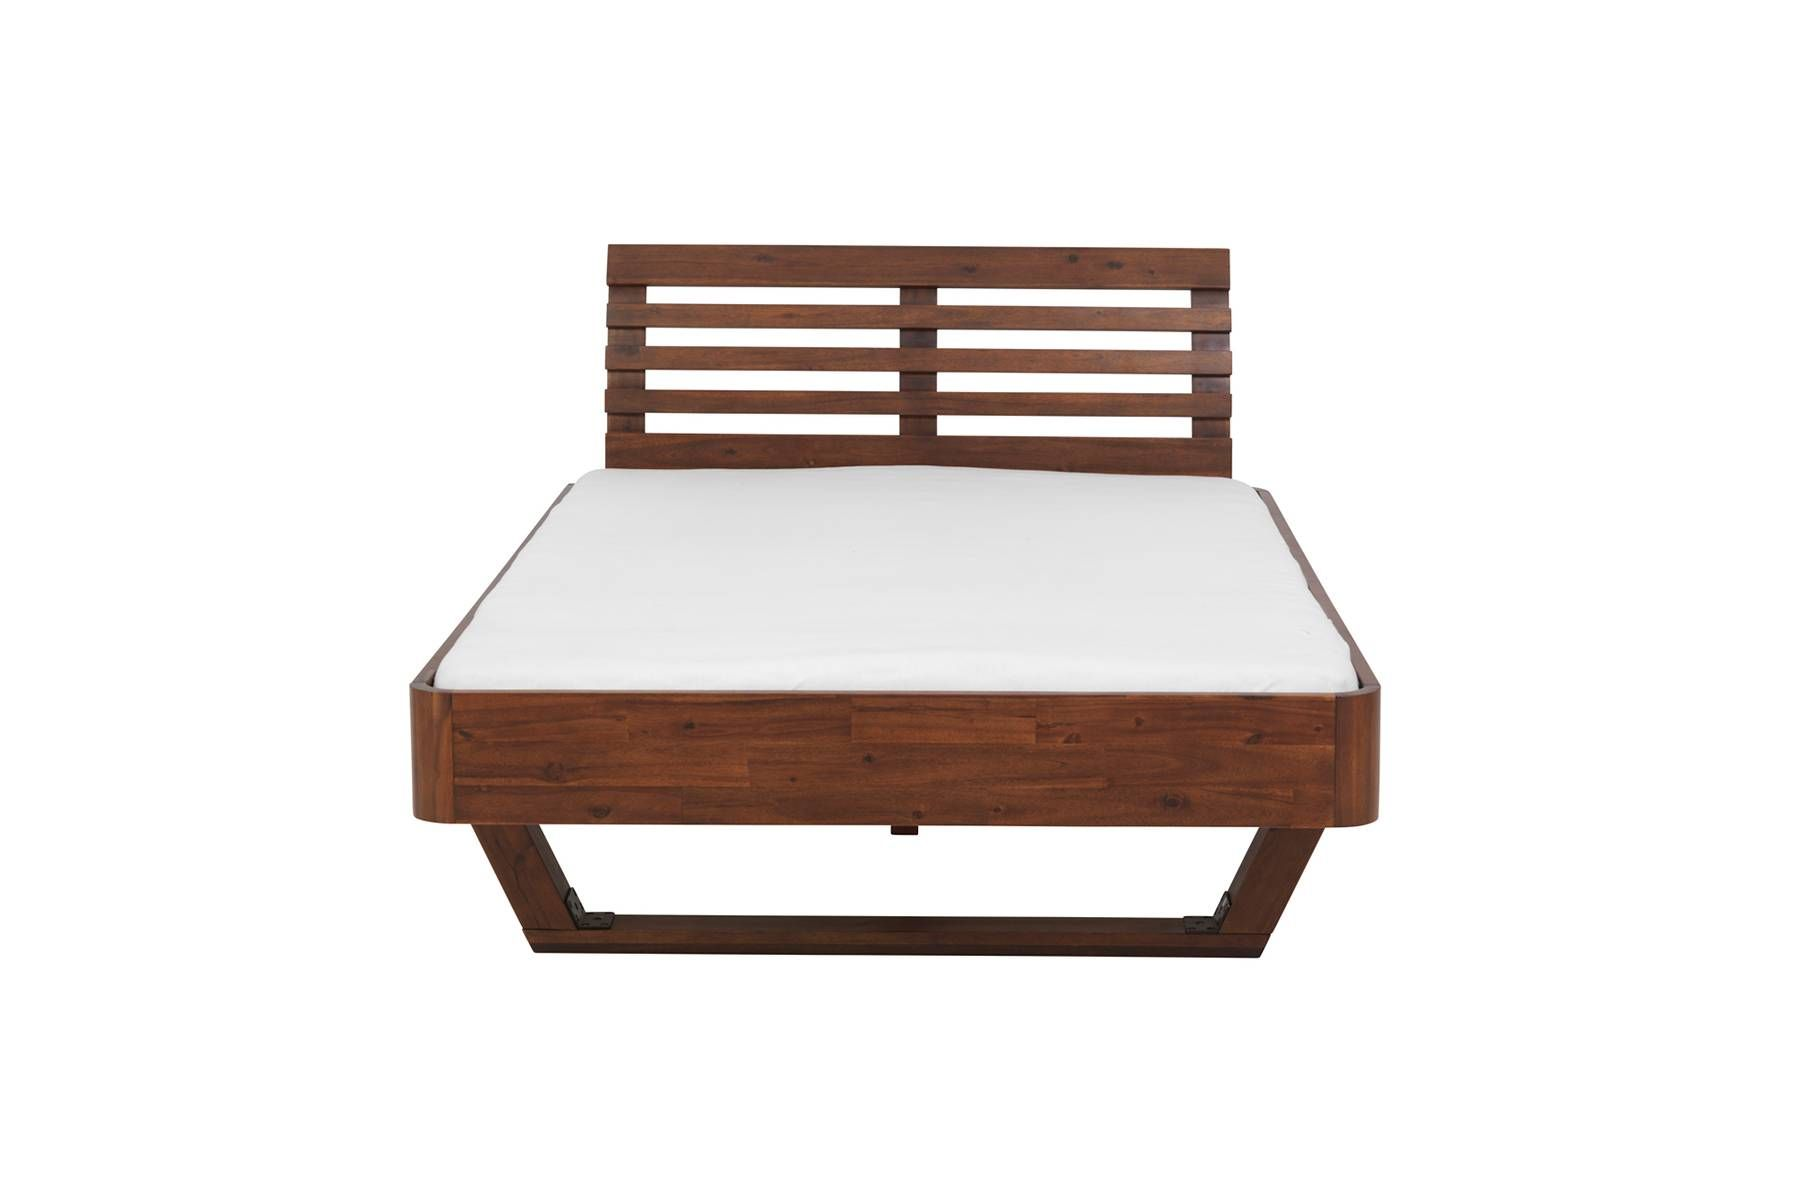 bett »aron« - betten - schlafzimmer - dänisches bettenlager ... - Schlafzimmer Dänisches Bettenlager